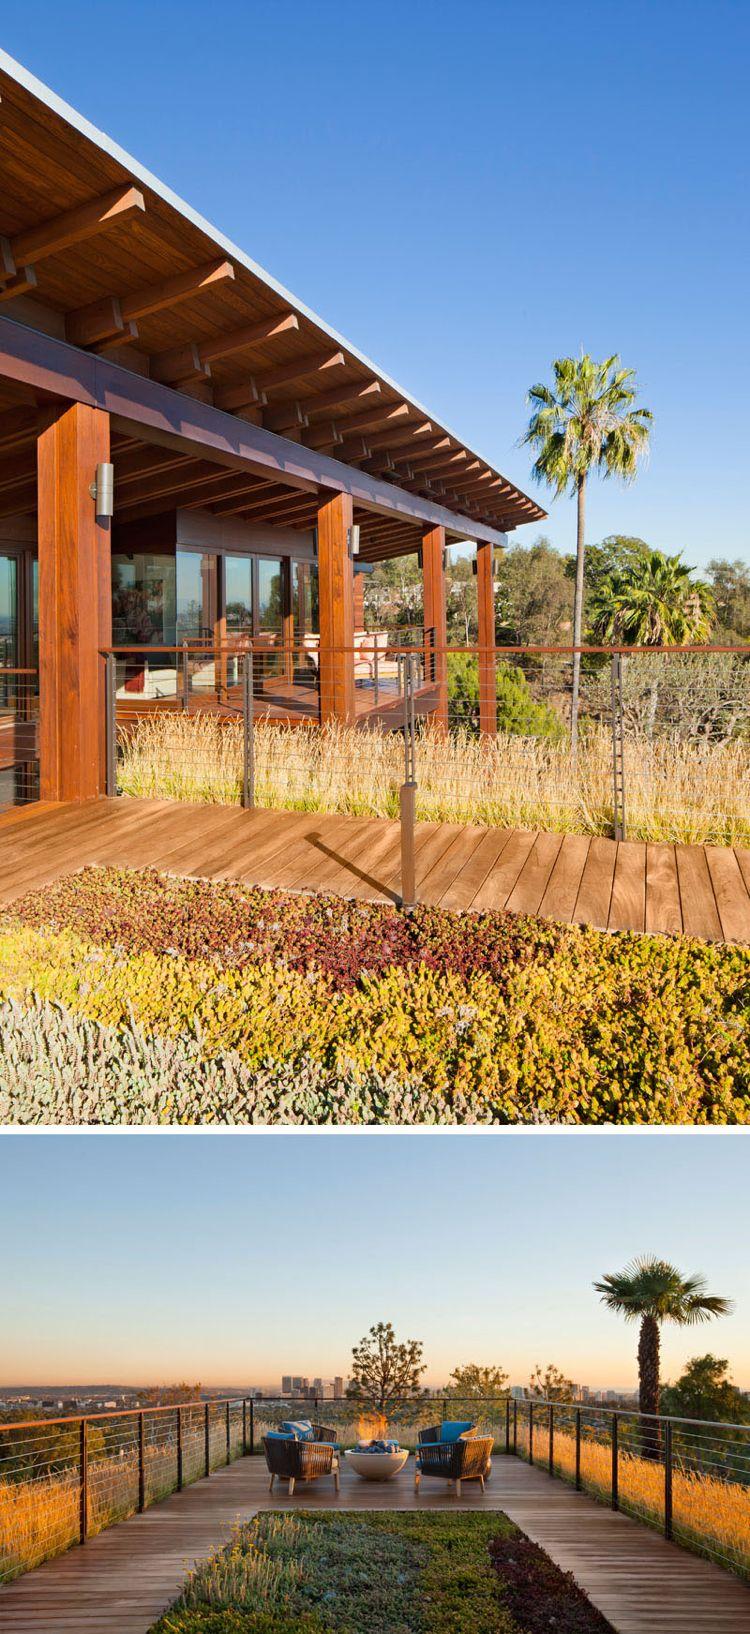 holz aussen outdoor holzdeck terrasse pflanzen aussicht